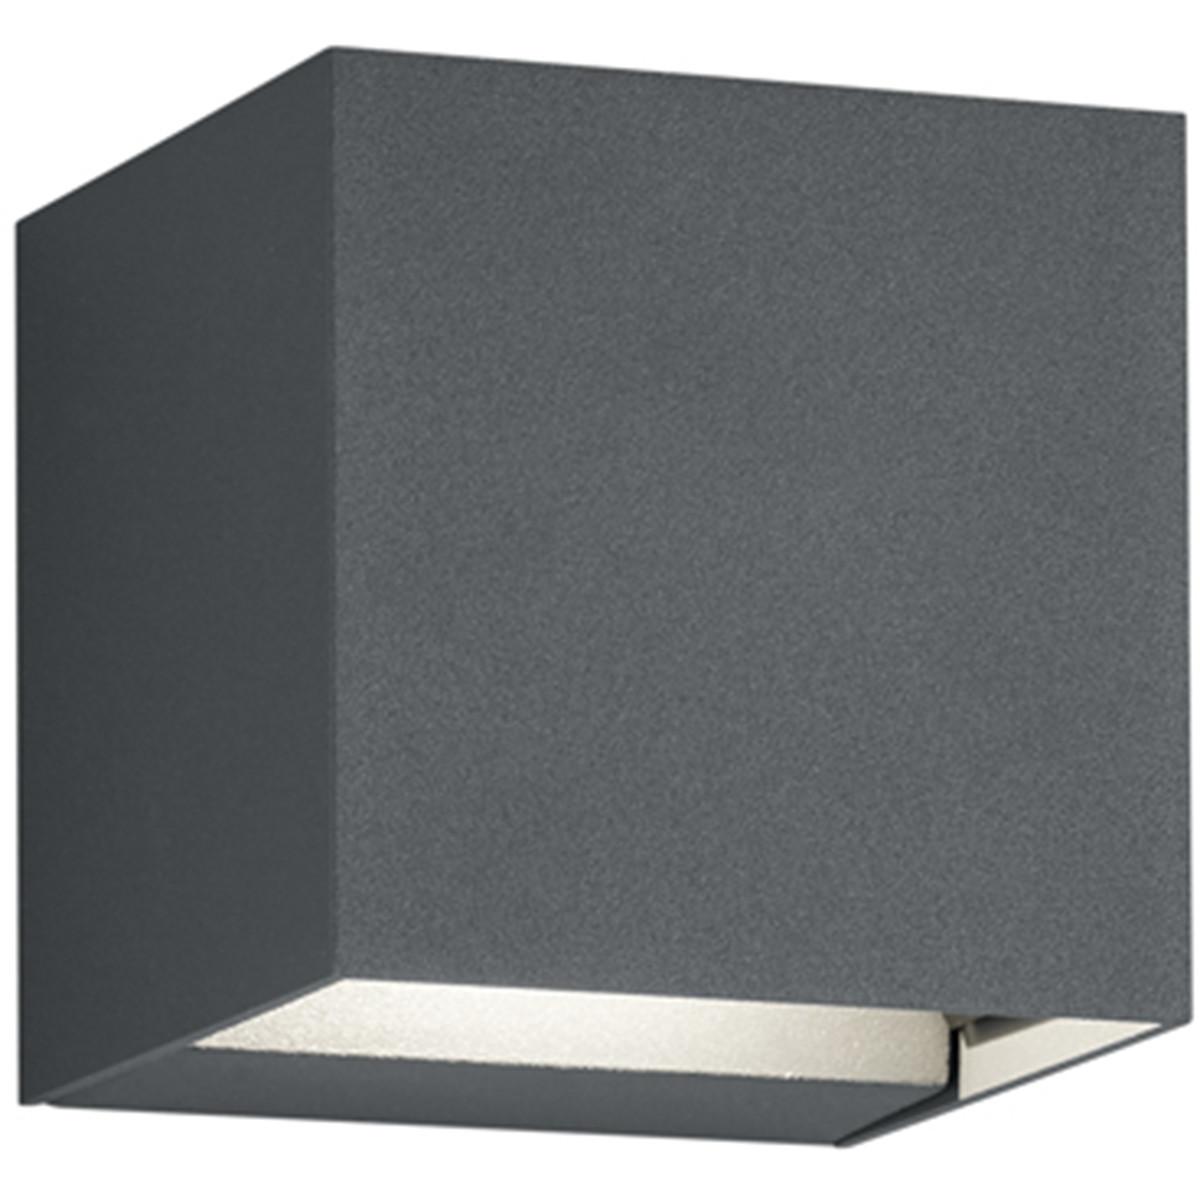 LED Tuinverlichting - Tuinlamp - Trion Adina - Wand - 6W - Warm Wit 3000K - Vierkant - Mat Zwart - A